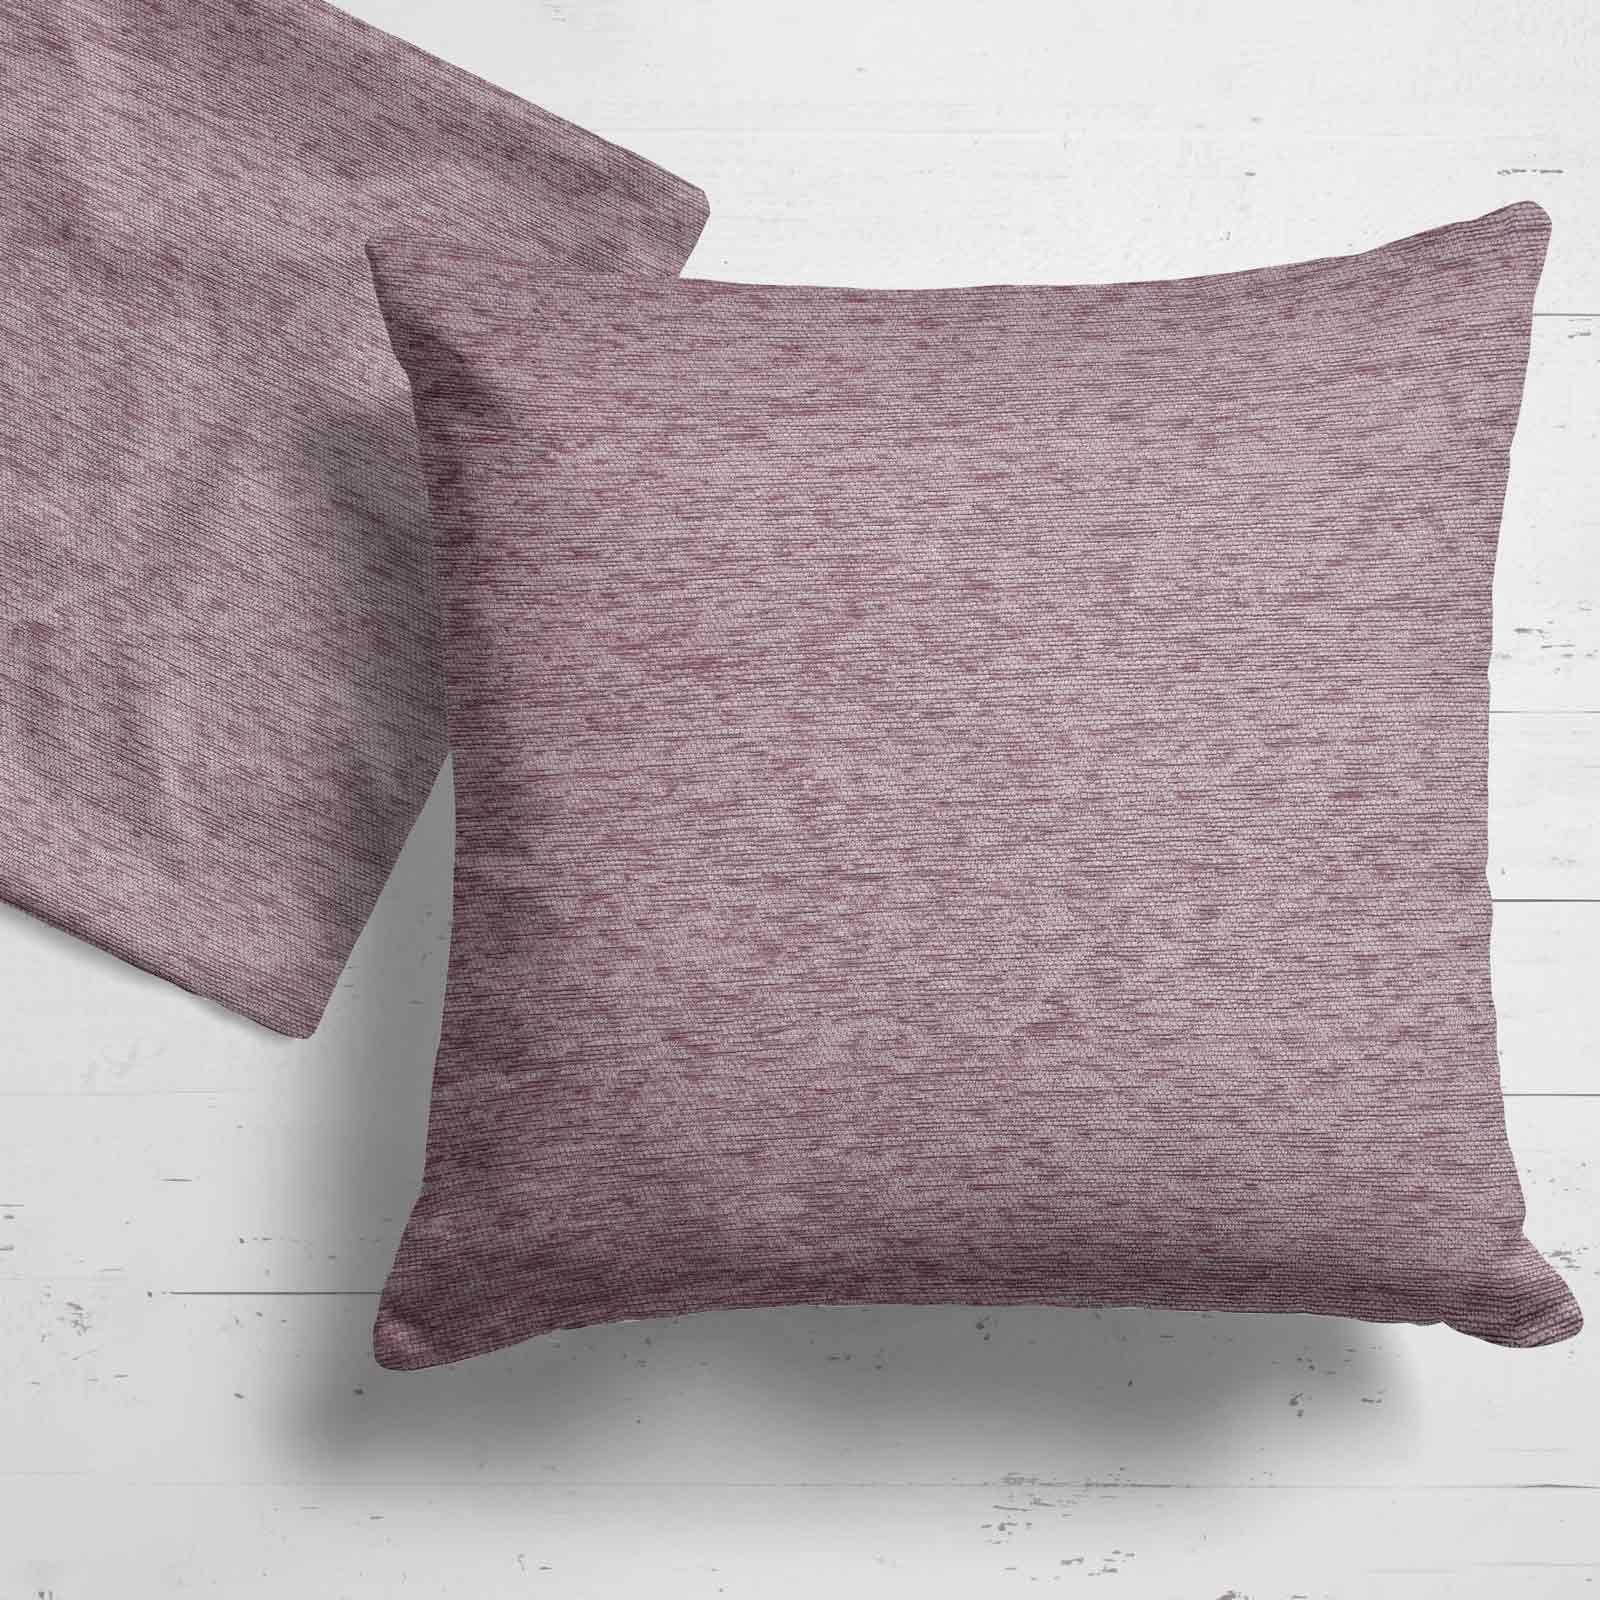 Set-of-2-Chenille-Cushion-Covers-Luxury-Plain-Cushions-Cover-Pairs-18-034-x-18-034 thumbnail 3